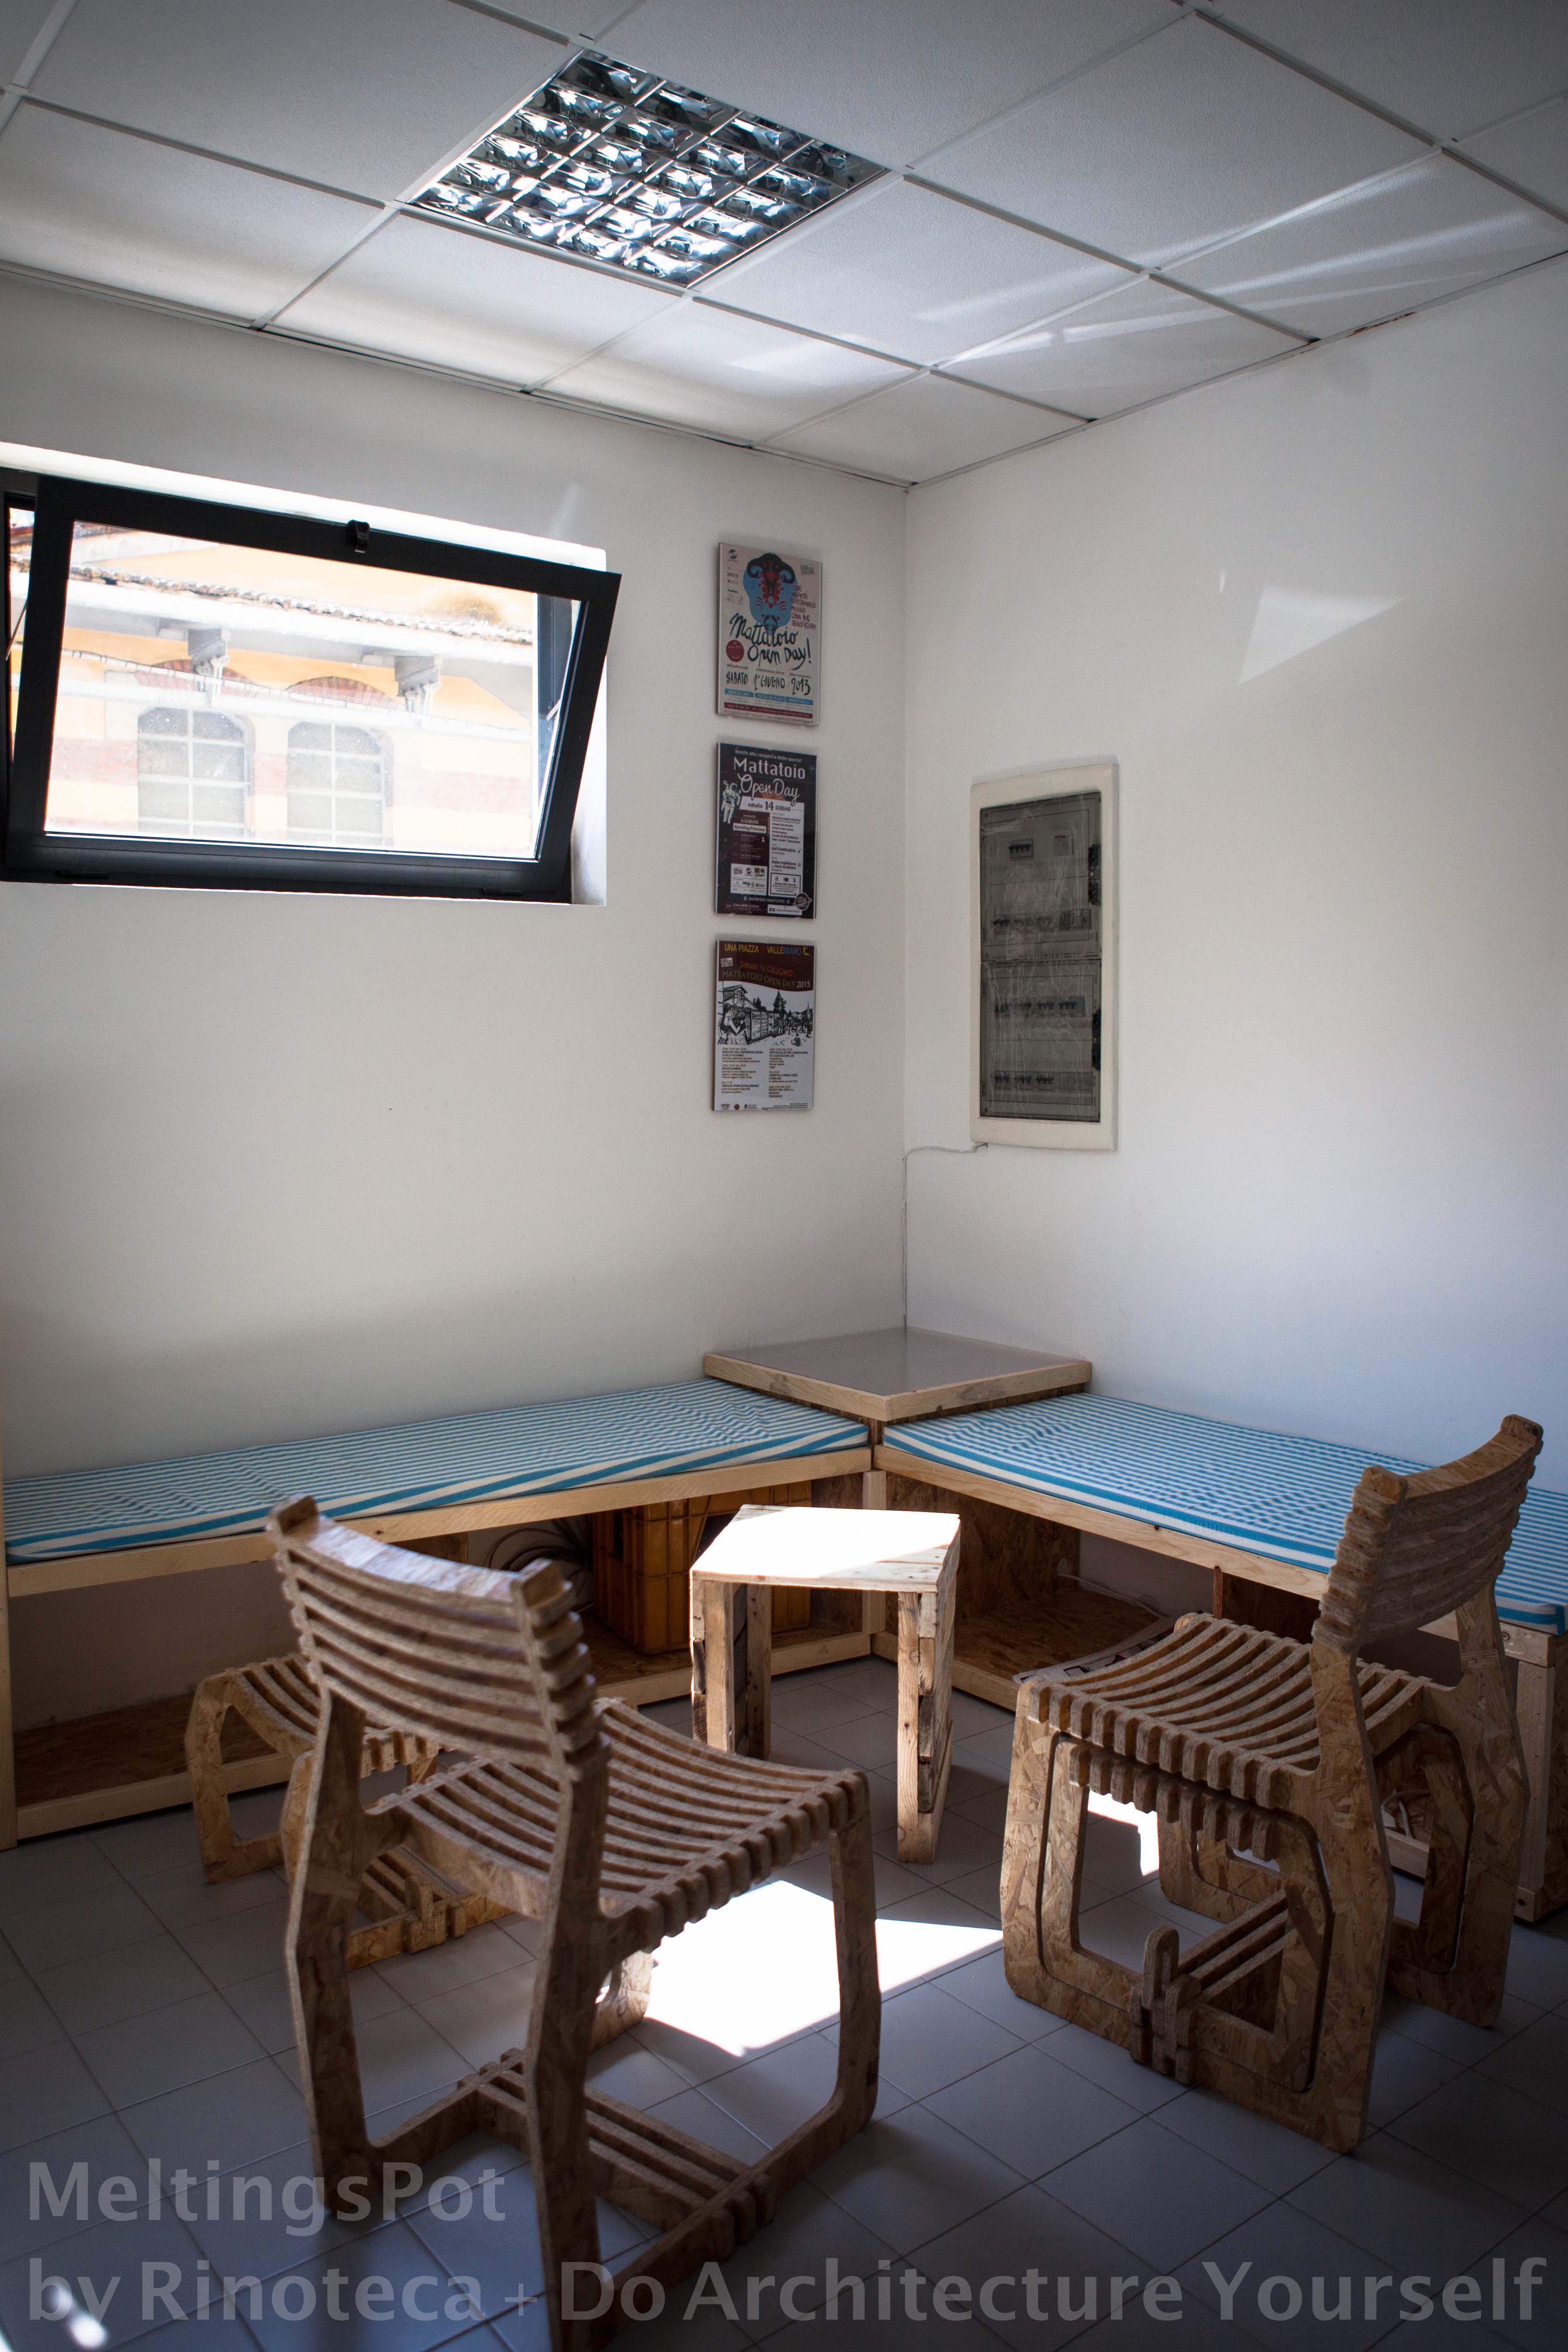 cdc-caffe-3